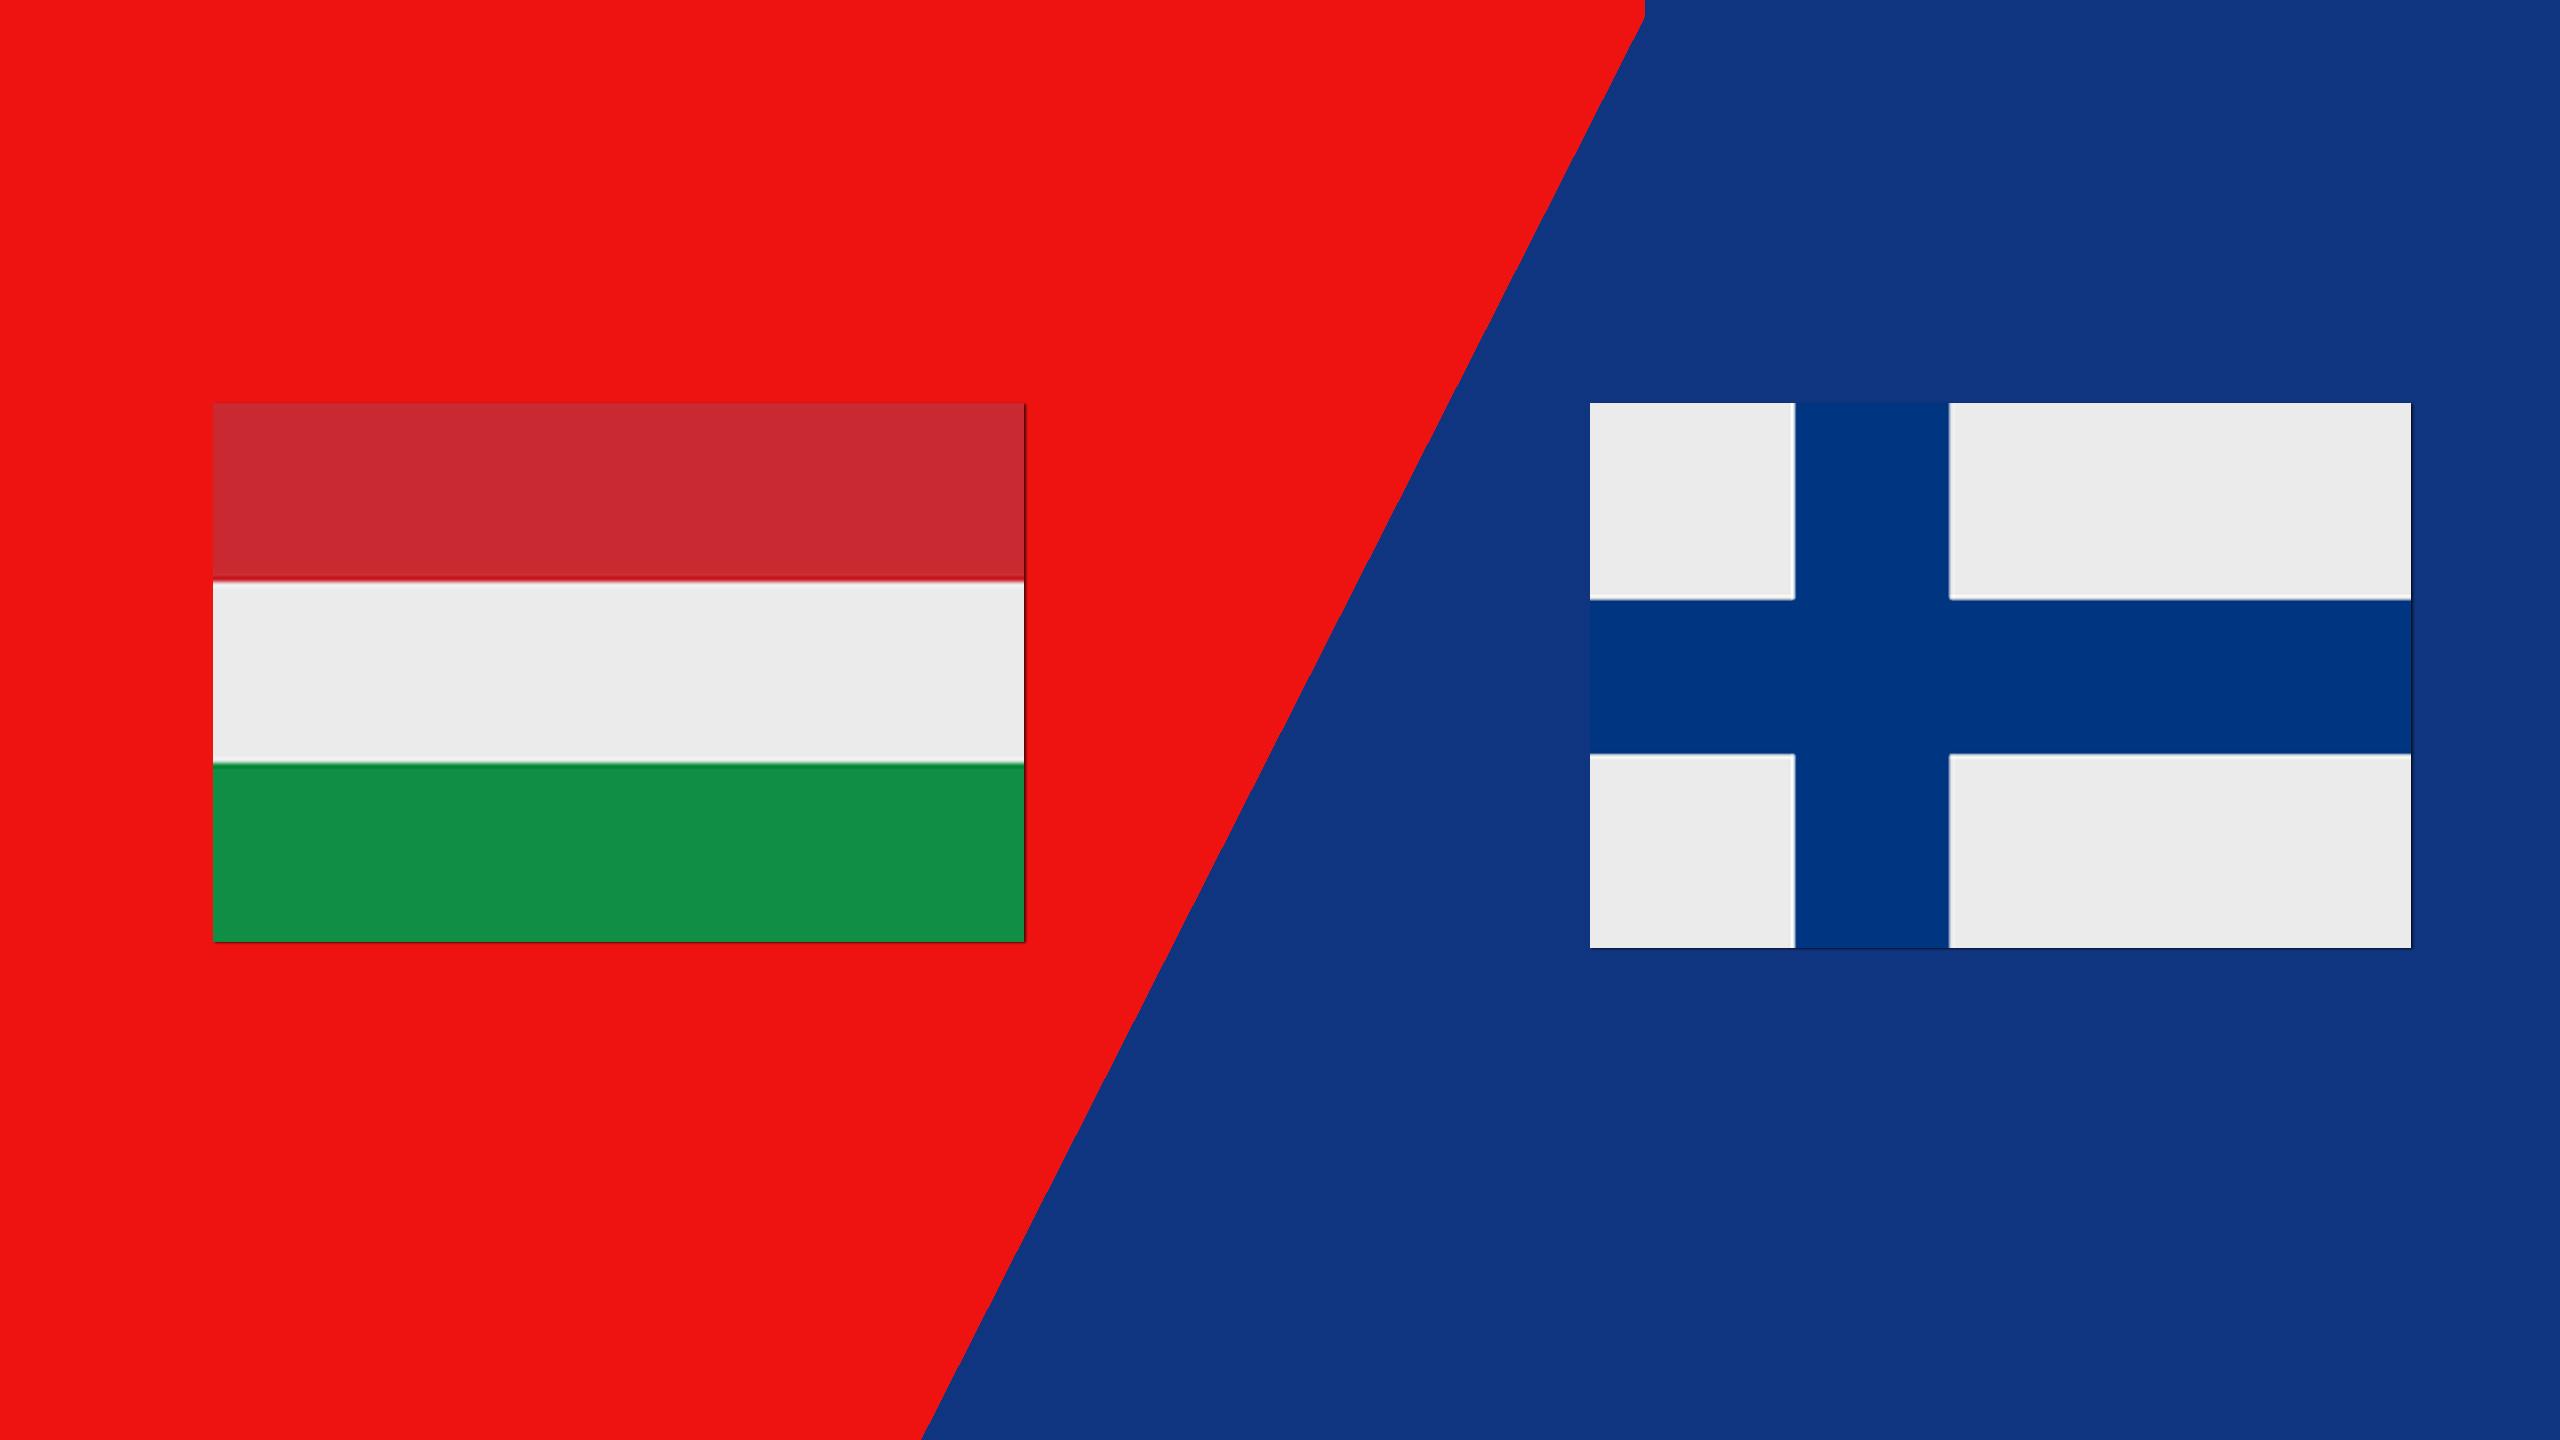 Hungary vs. Finland